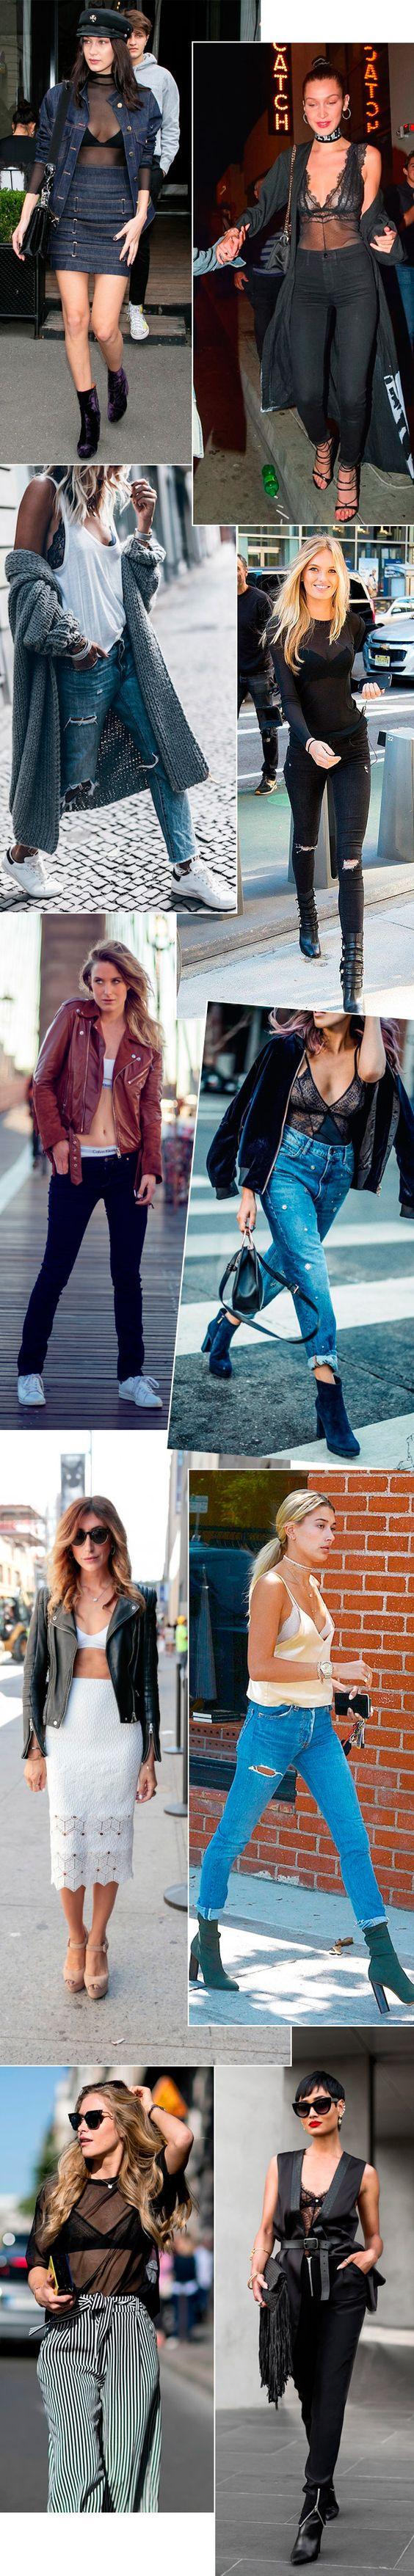 Street style look com lingerie aparente.: